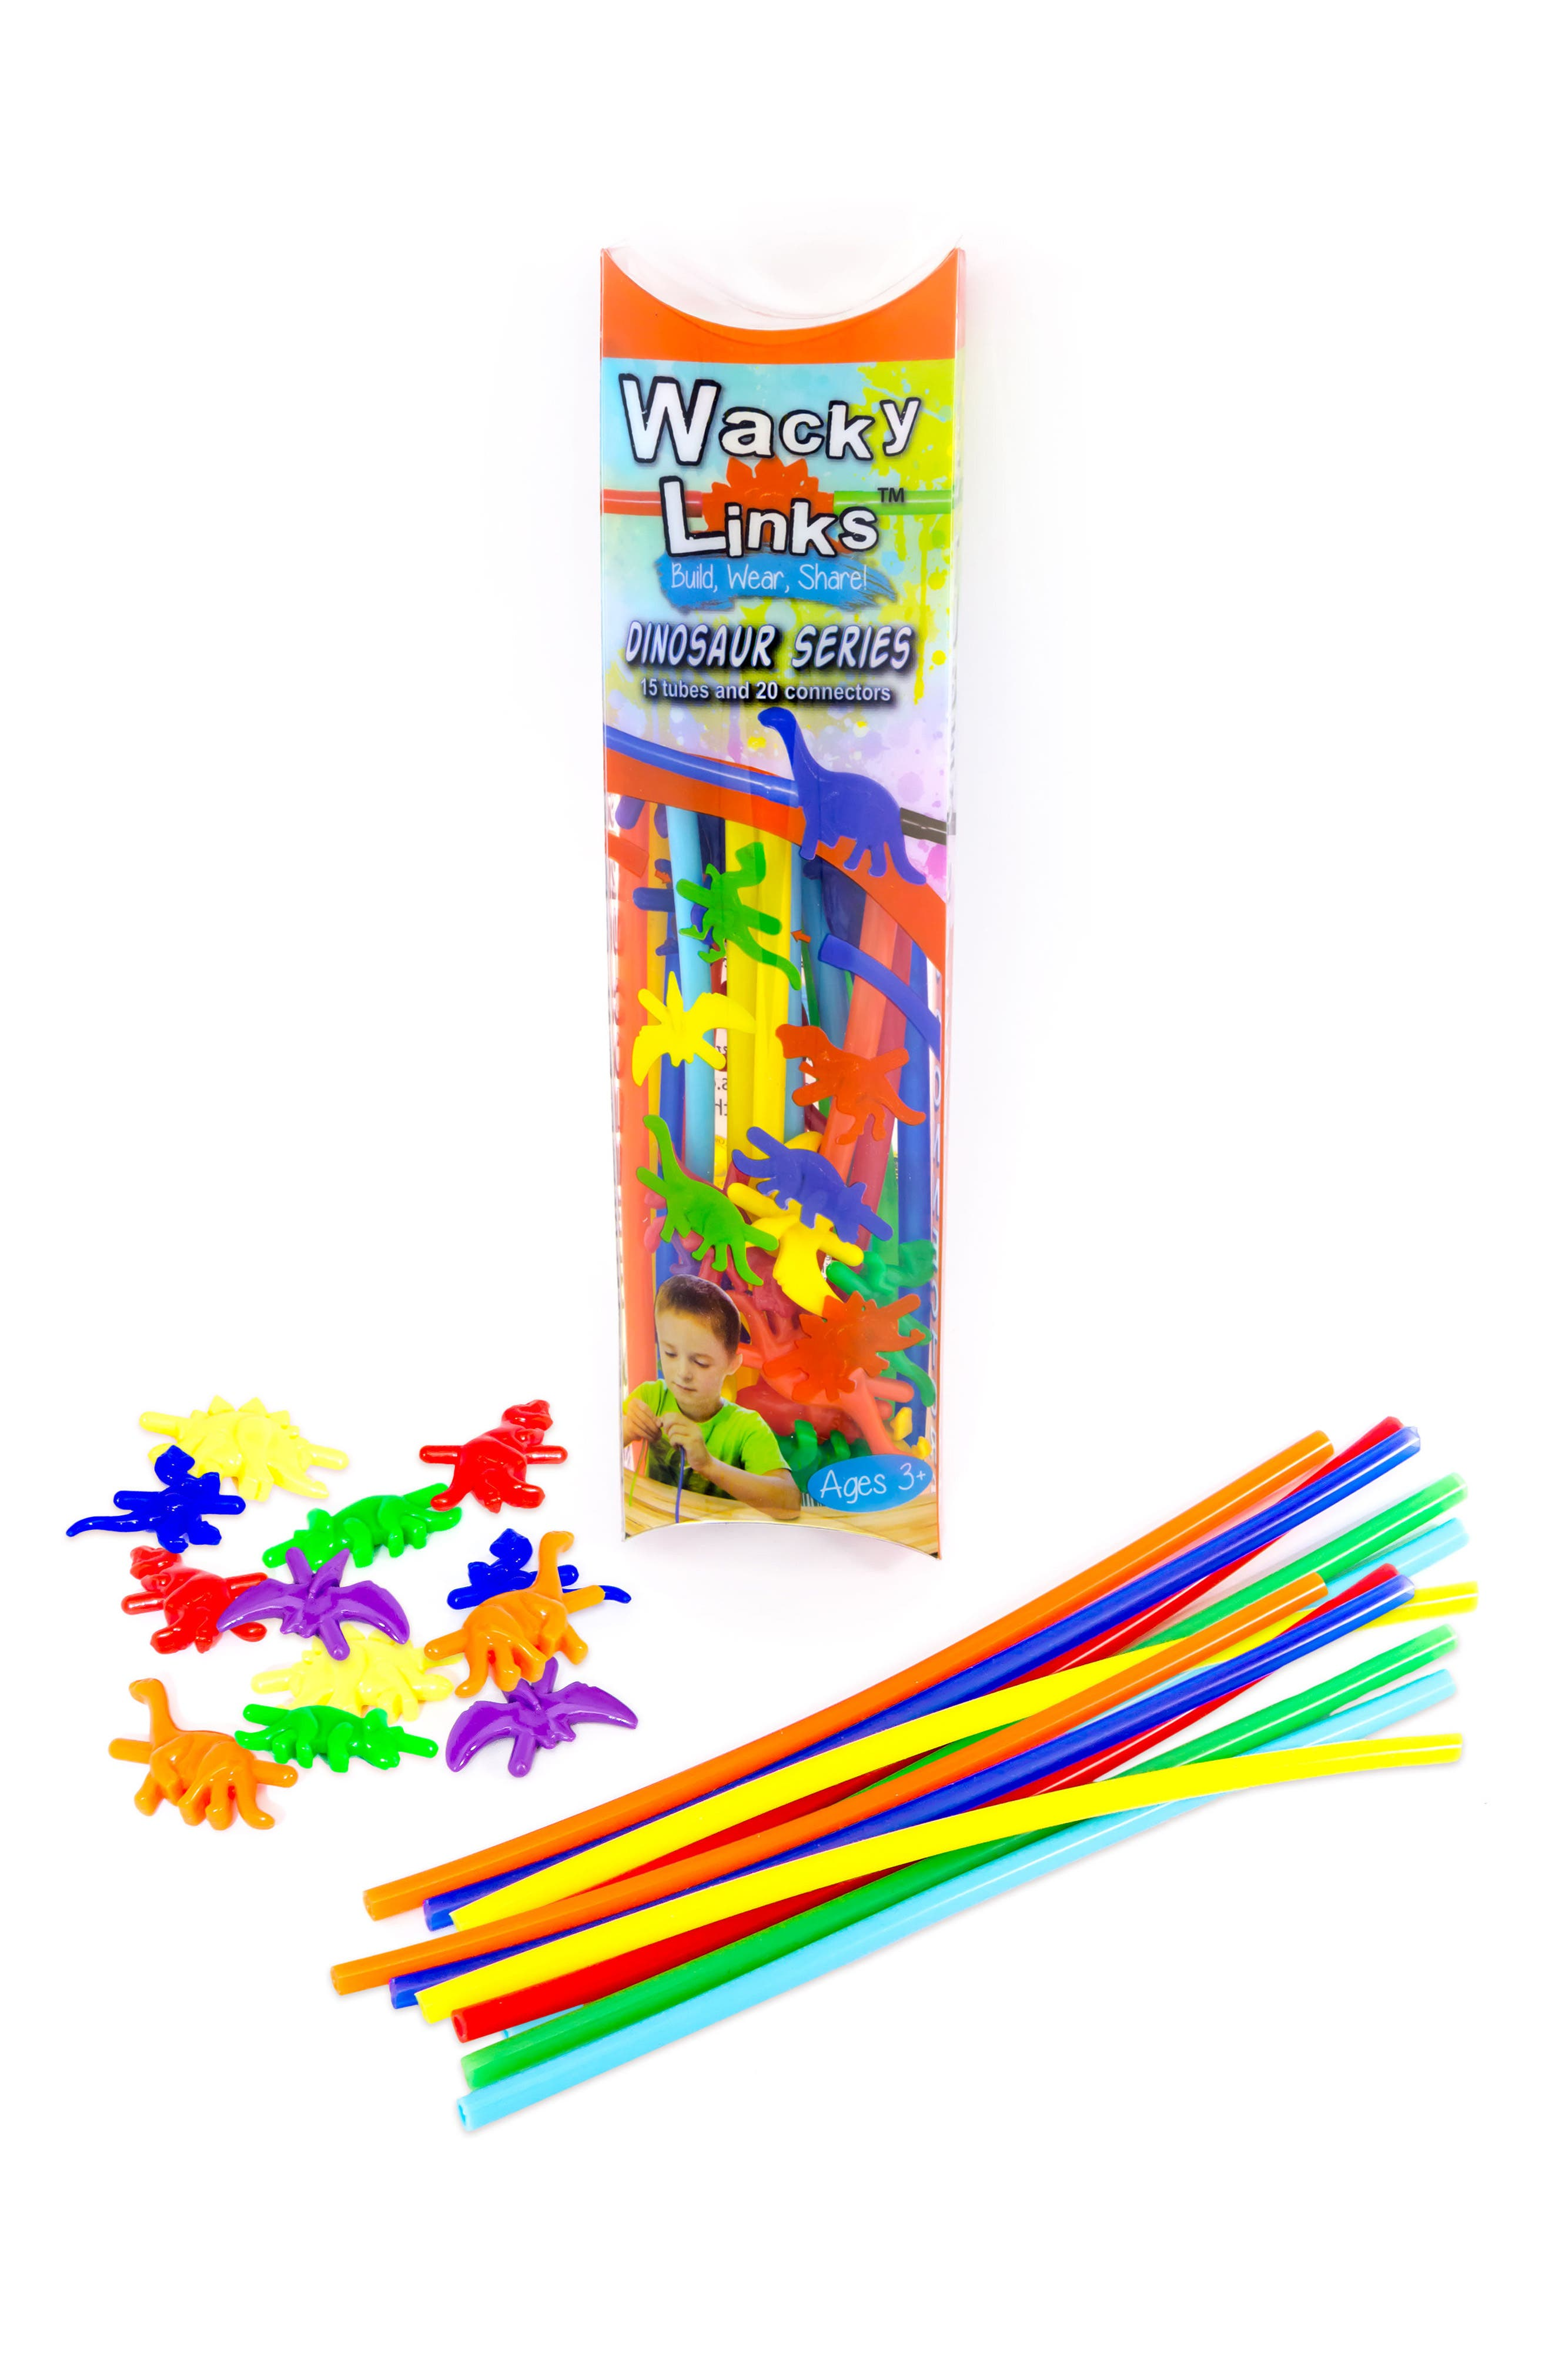 35-Piece Dinosaur Series Linking Toy Kit,                             Main thumbnail 1, color,